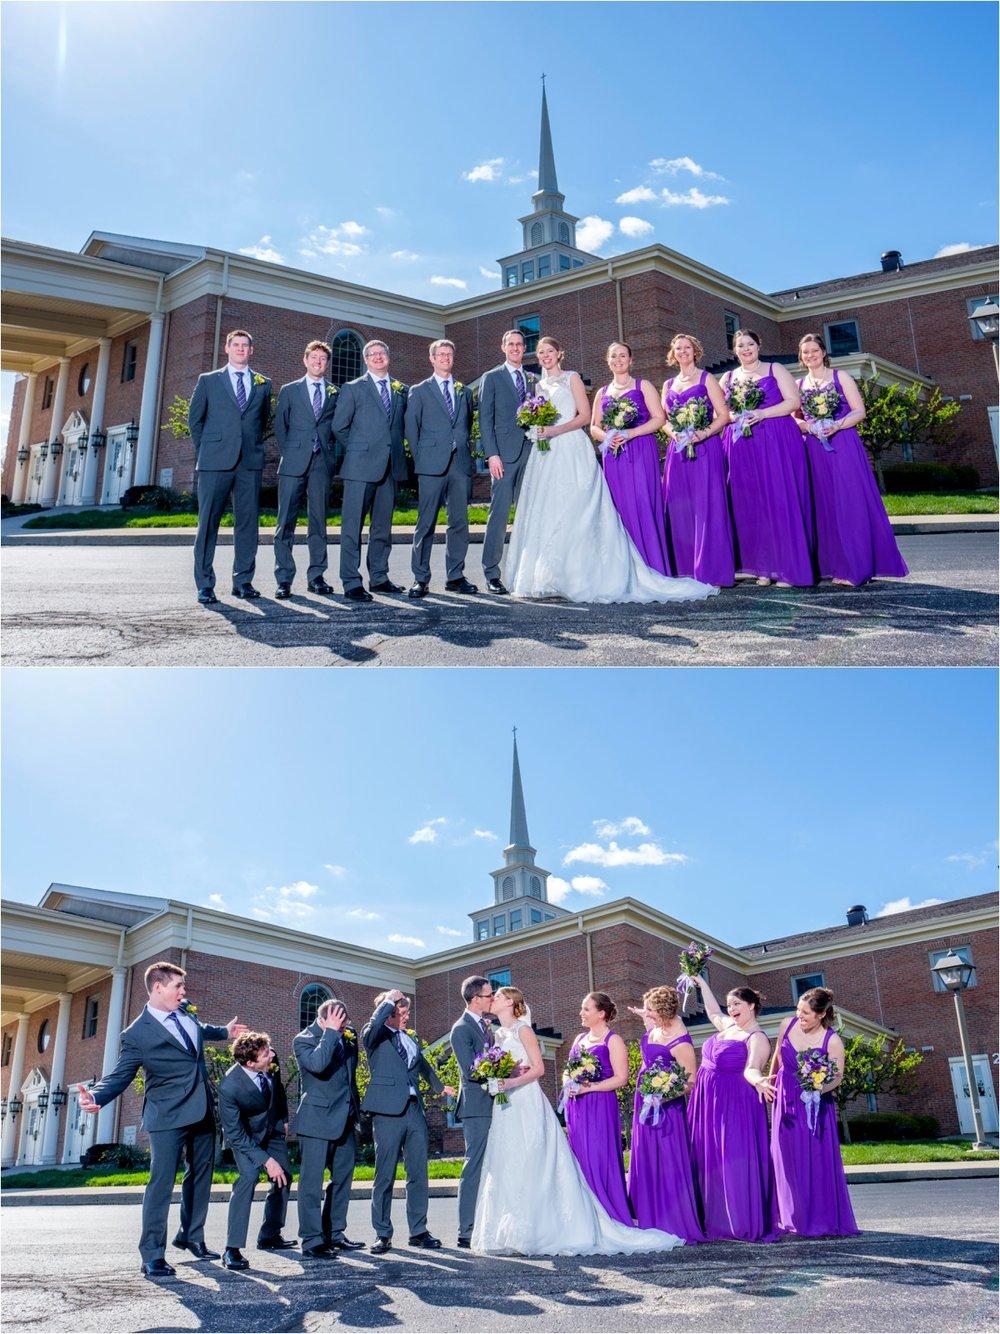 Plainfield-Christian-Church-Washington-Township-Park-Pavilion-Wedding-Pictures_0014.jpg